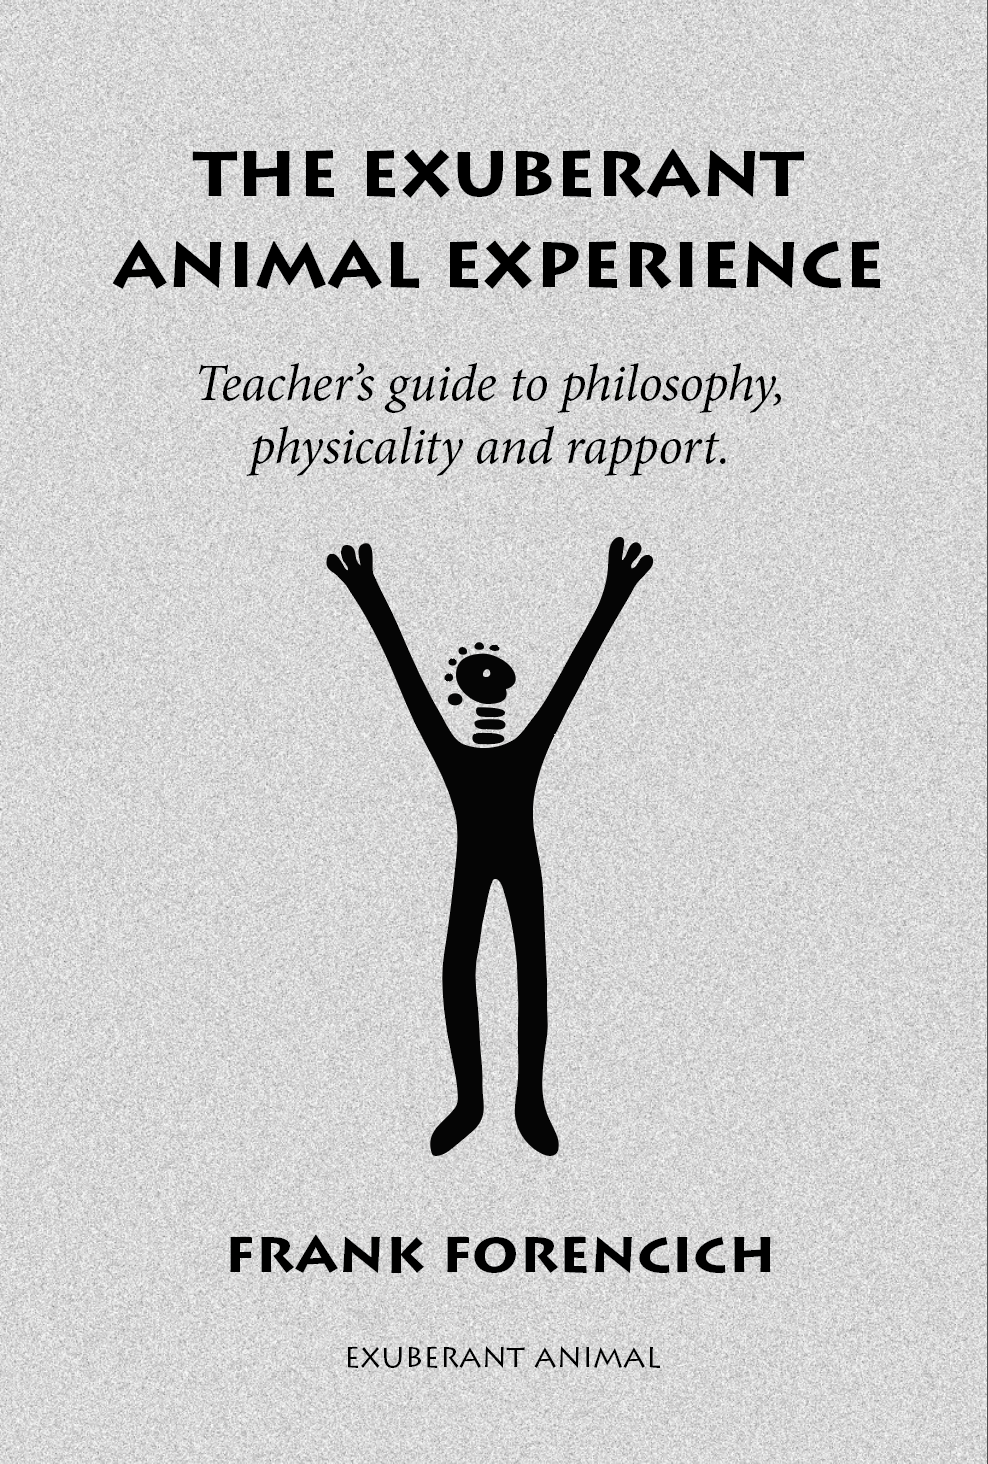 EAE Exuberant book cover copy.png